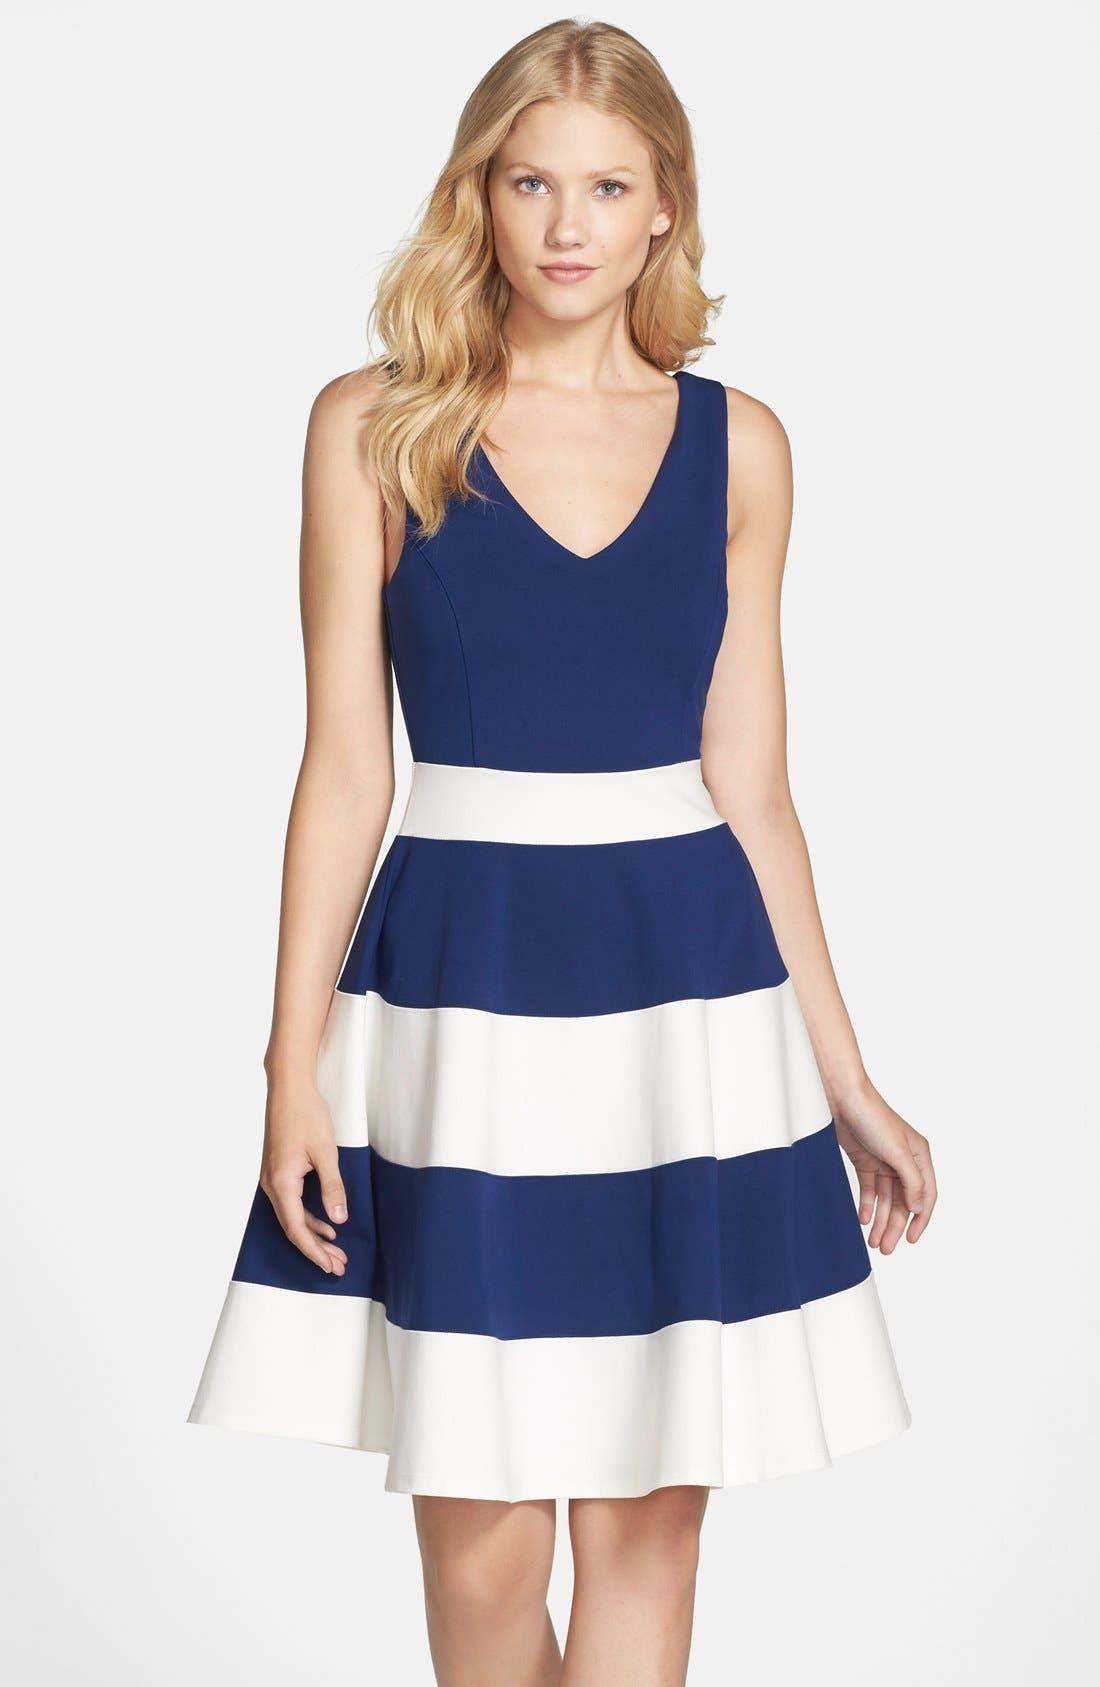 Joice Sleeveless Fit & Flare Dress,                             Main thumbnail 1, color,                             NAVY/ WHITE